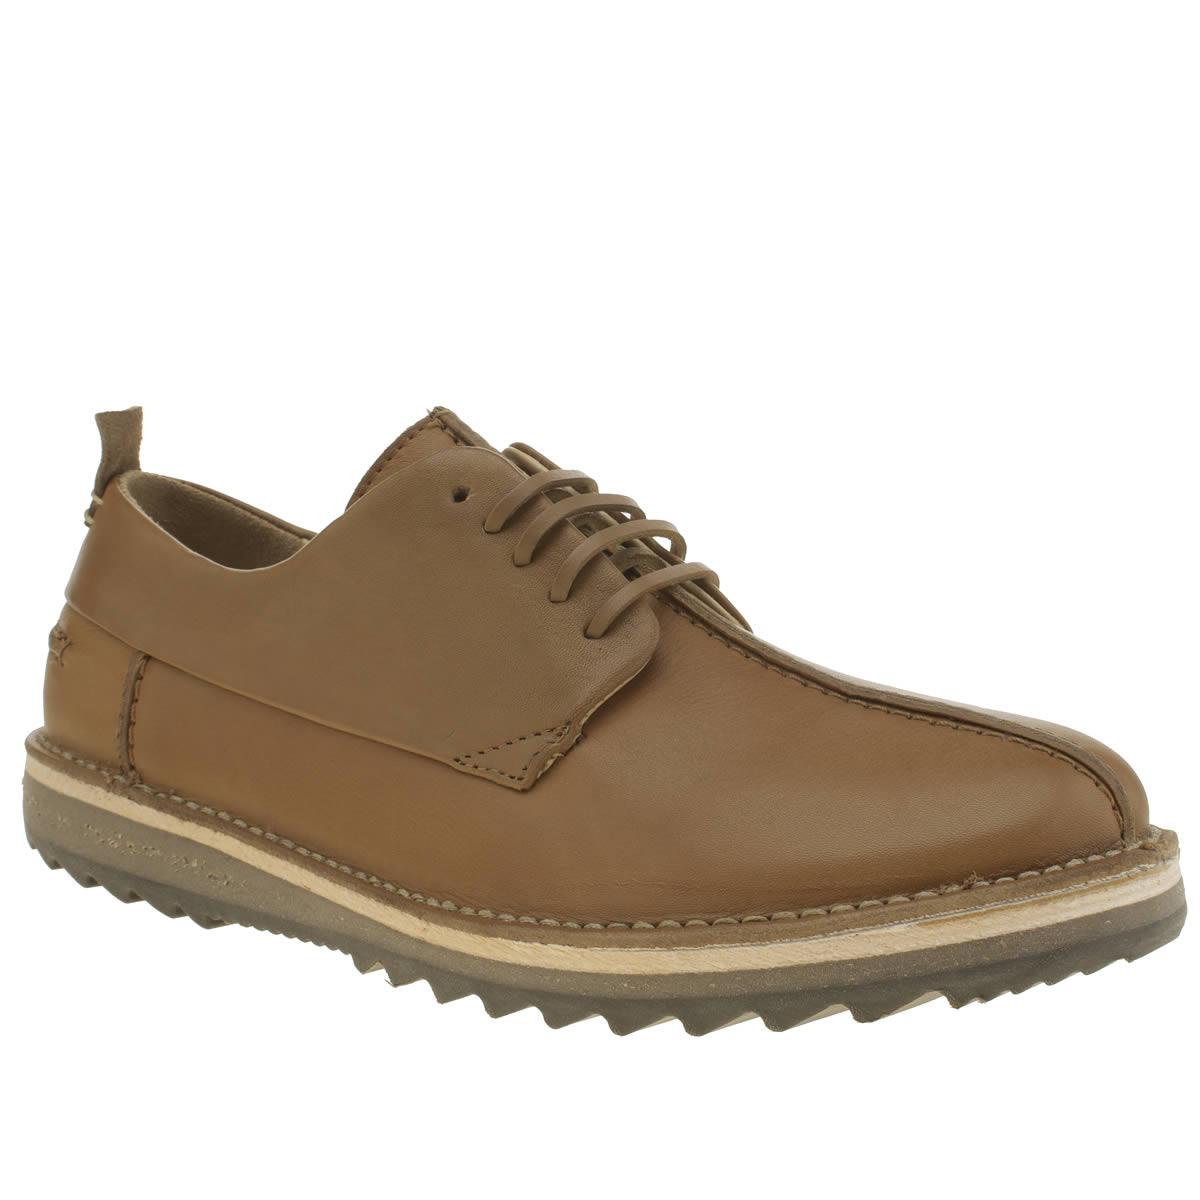 Northern Cobbler Northern Cobbler Tan Cobia Shoes